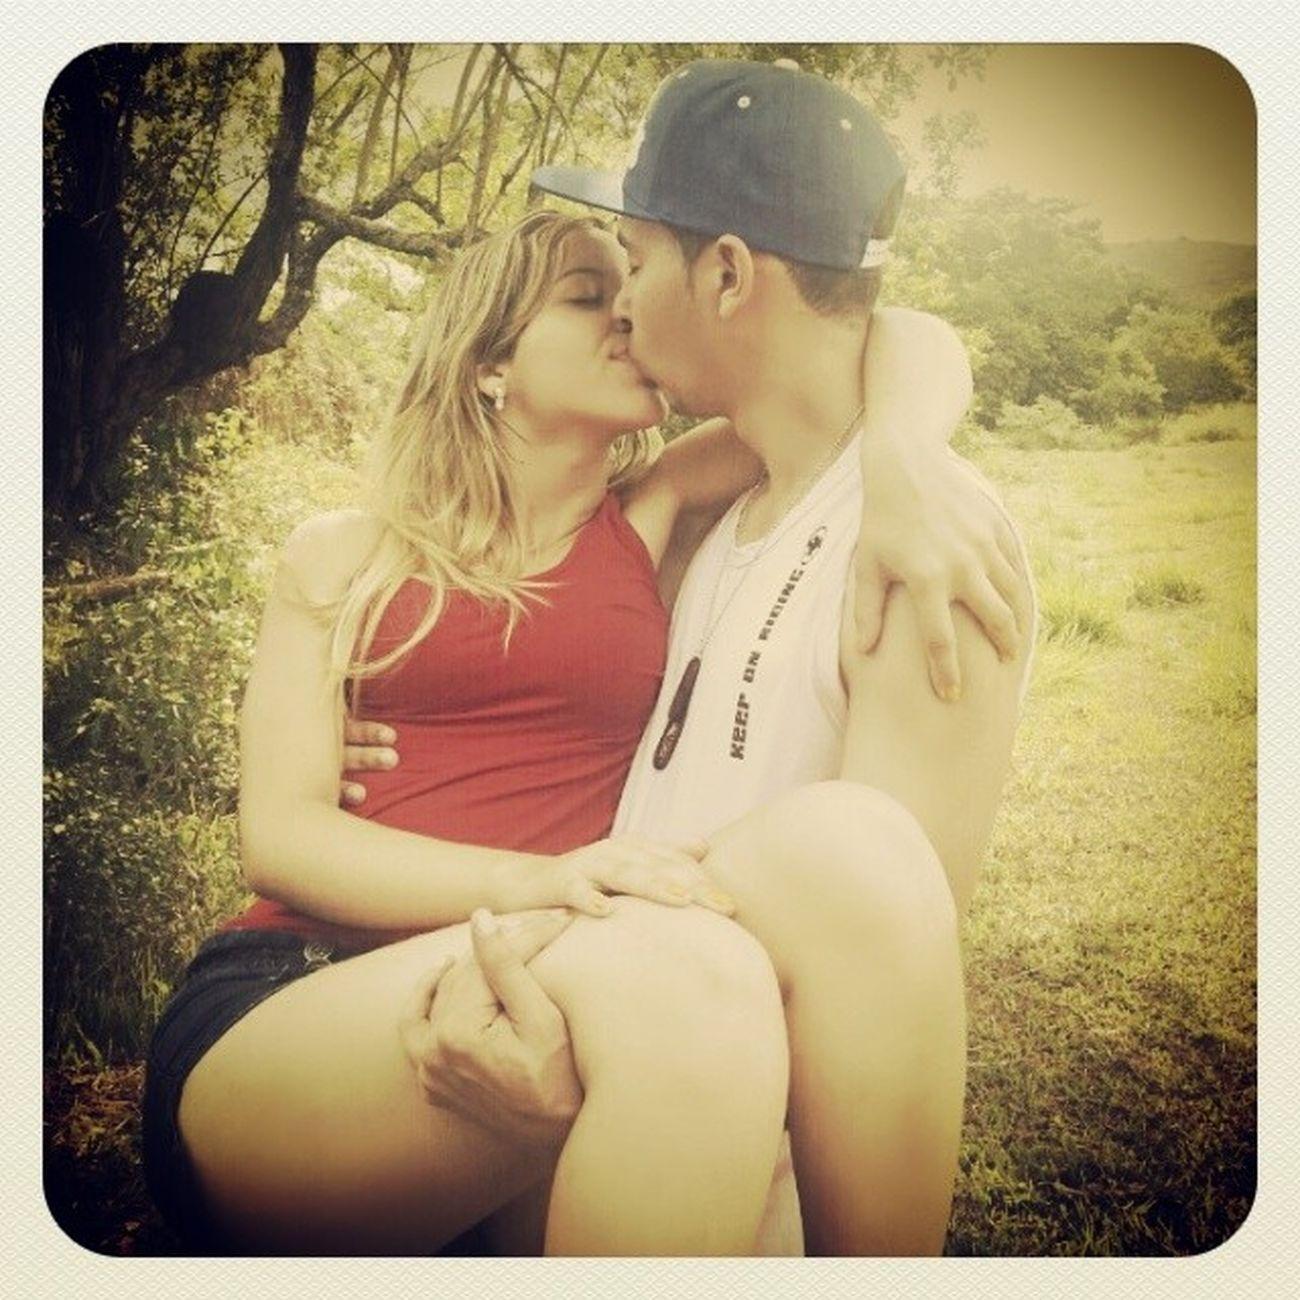 Andreza Te amo Meuanjo ♥♥